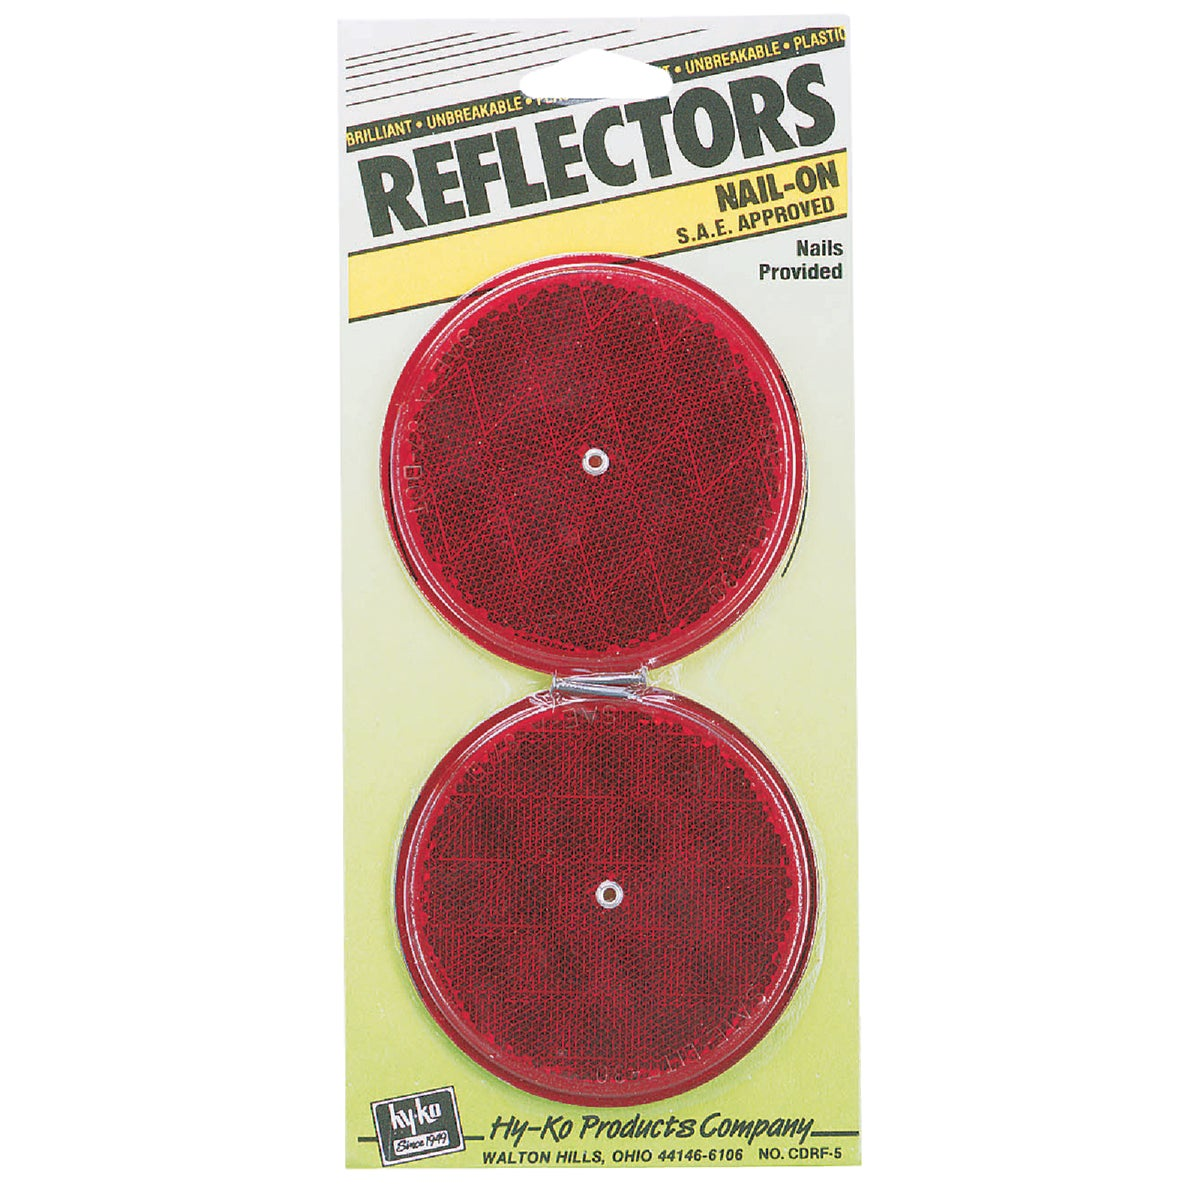 NAIL ON RED REFLECTORS